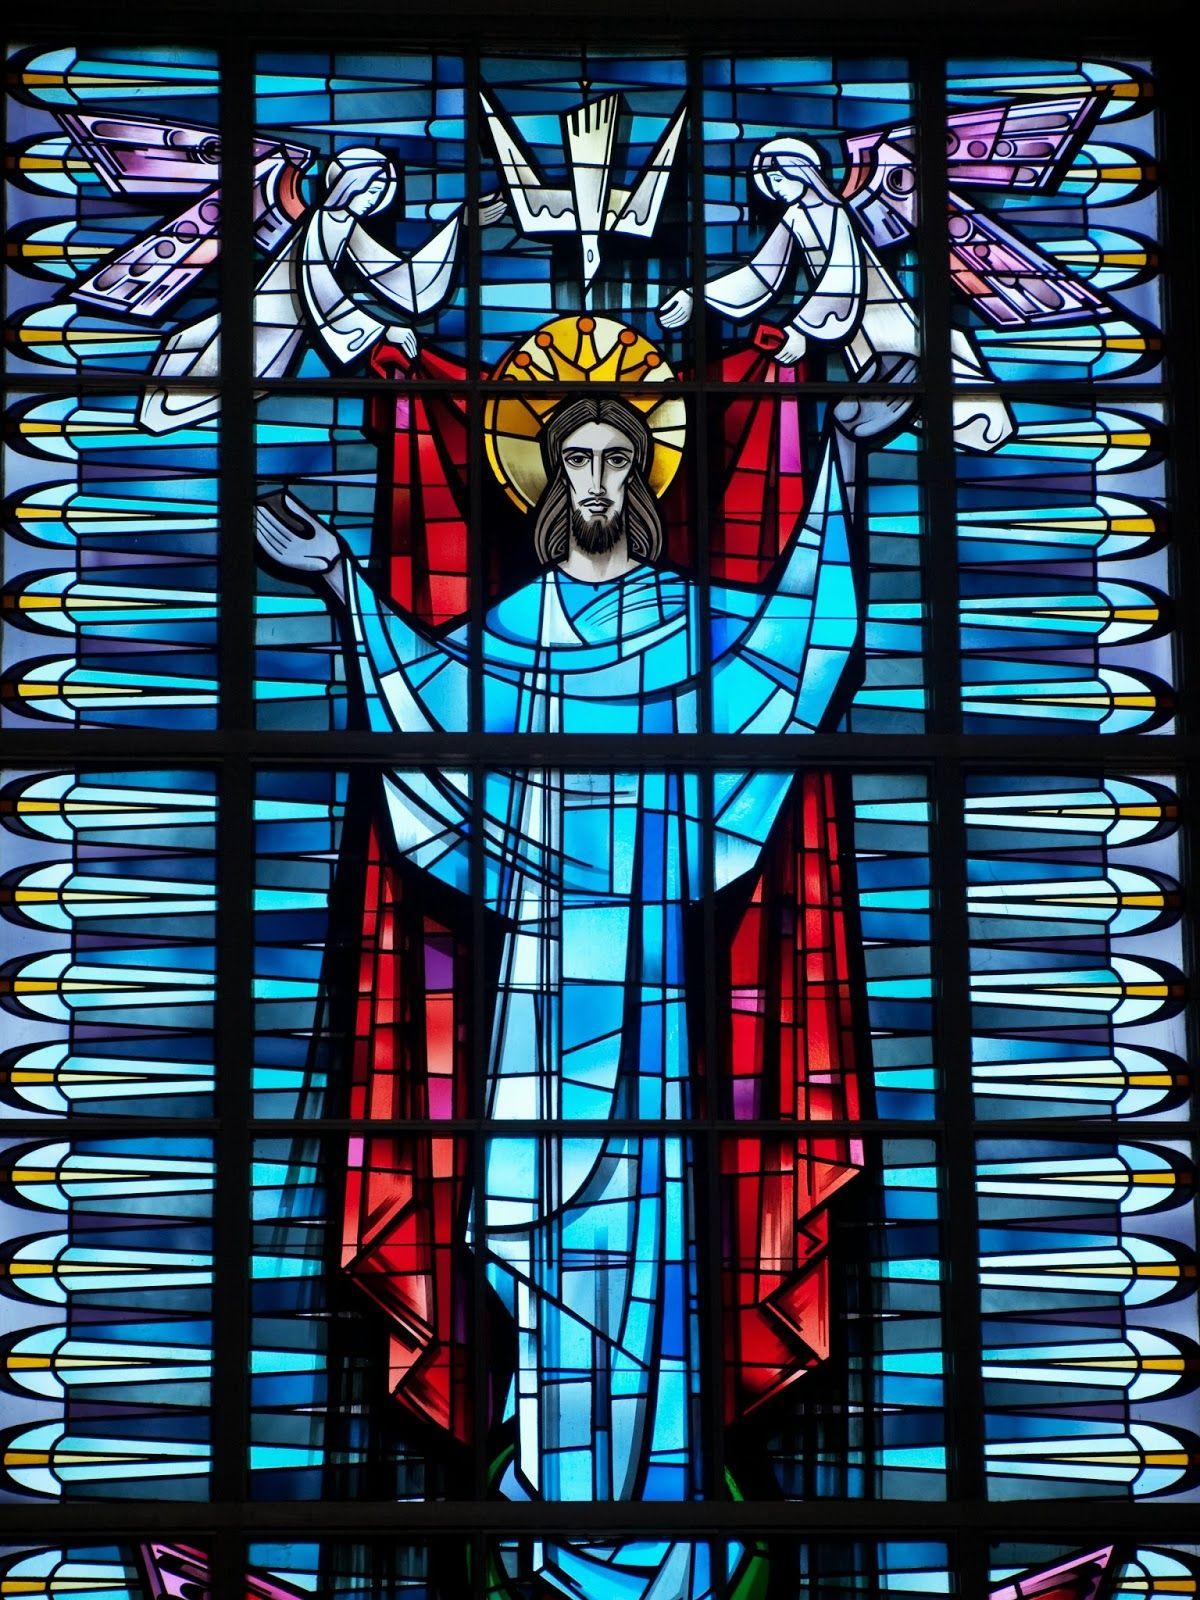 Window in the chapel of Concordia University, Mequon, Wisconsin.